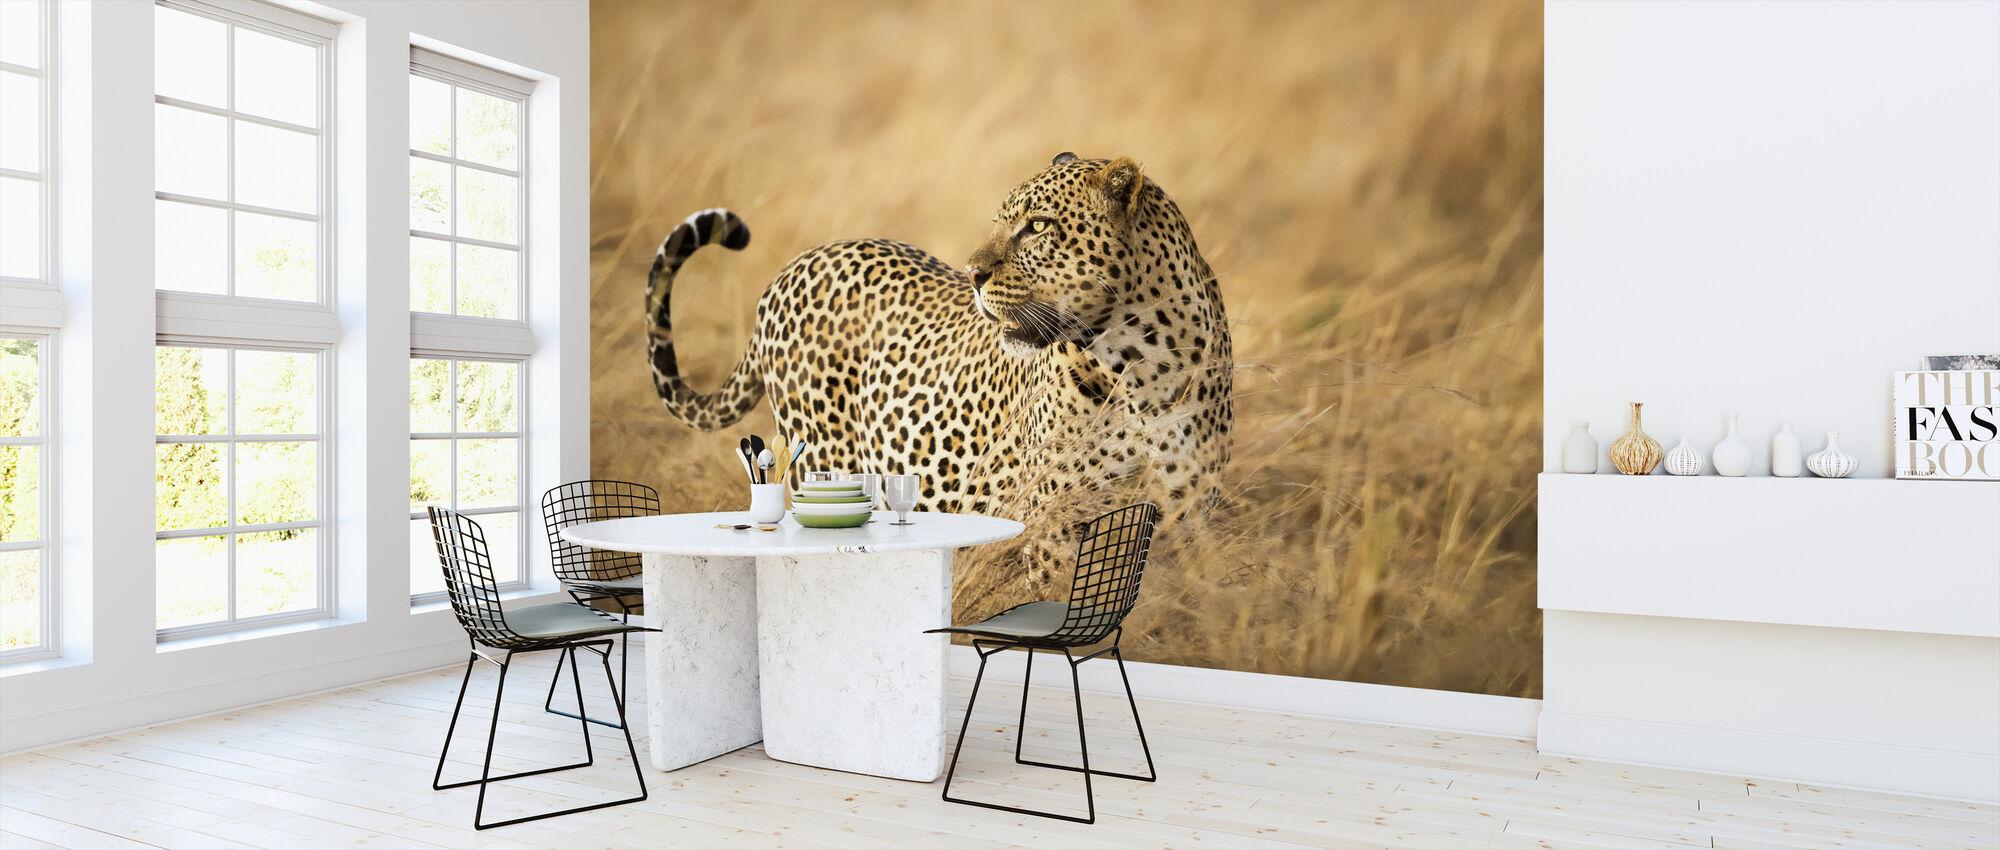 Watching - Wallpaper - Kitchen